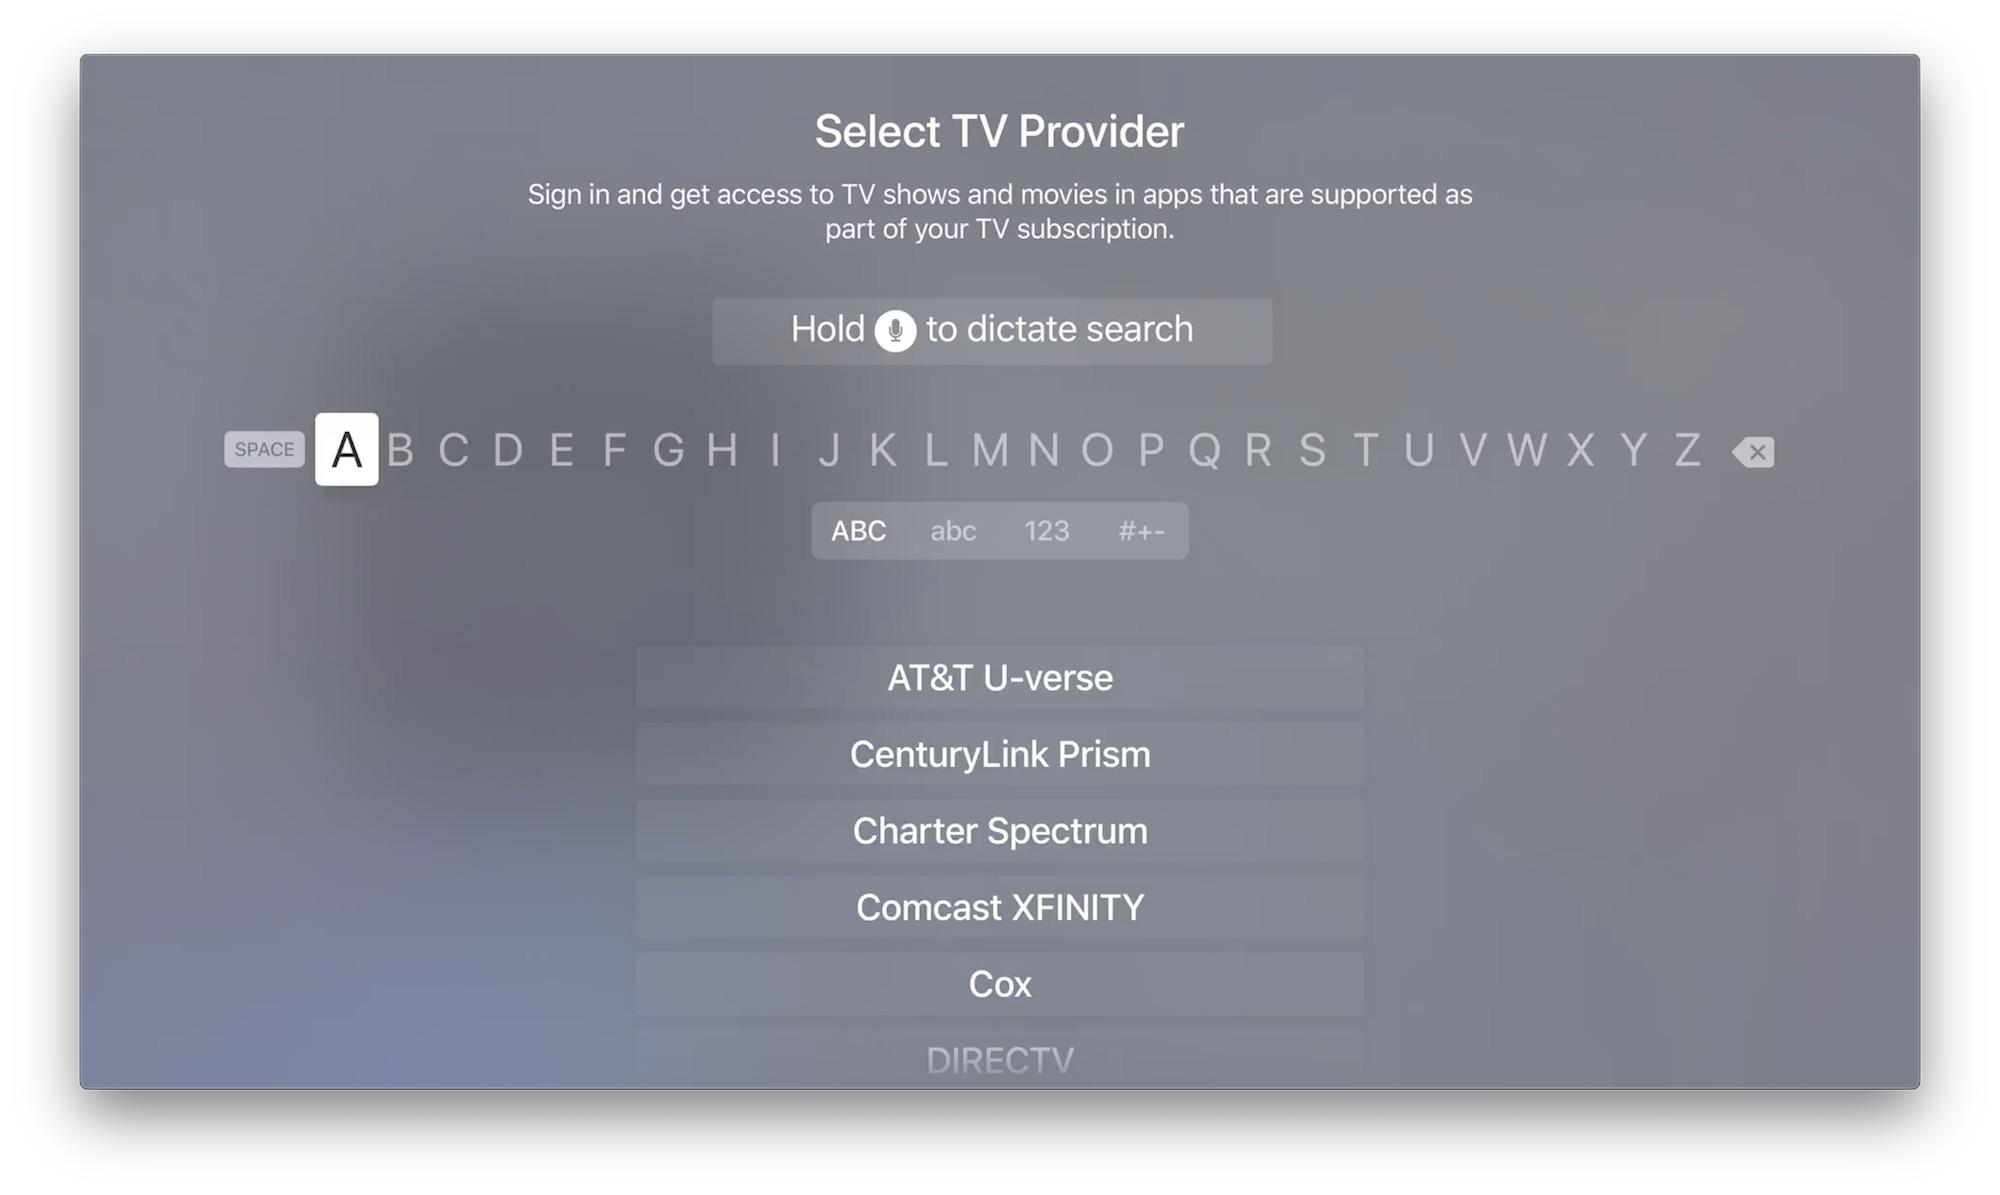 Select TV Provider